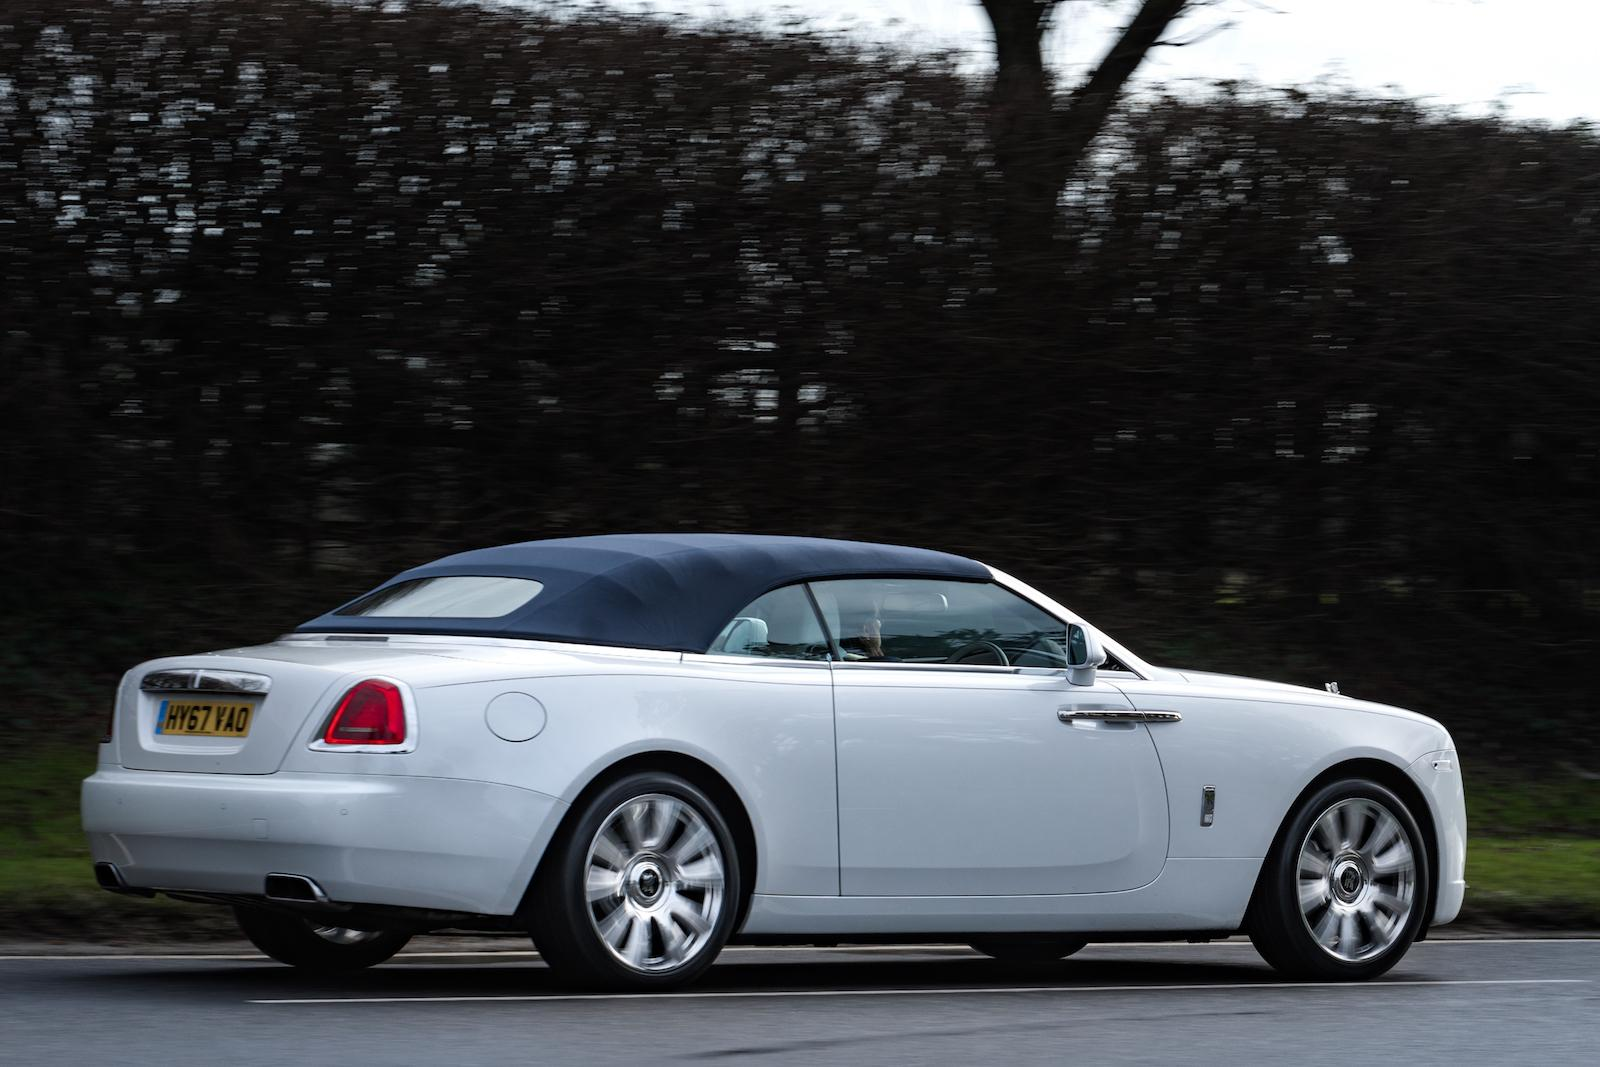 On the trail of Sikorski\'s Rolls-Royce Phantom III | Autoclassics.com